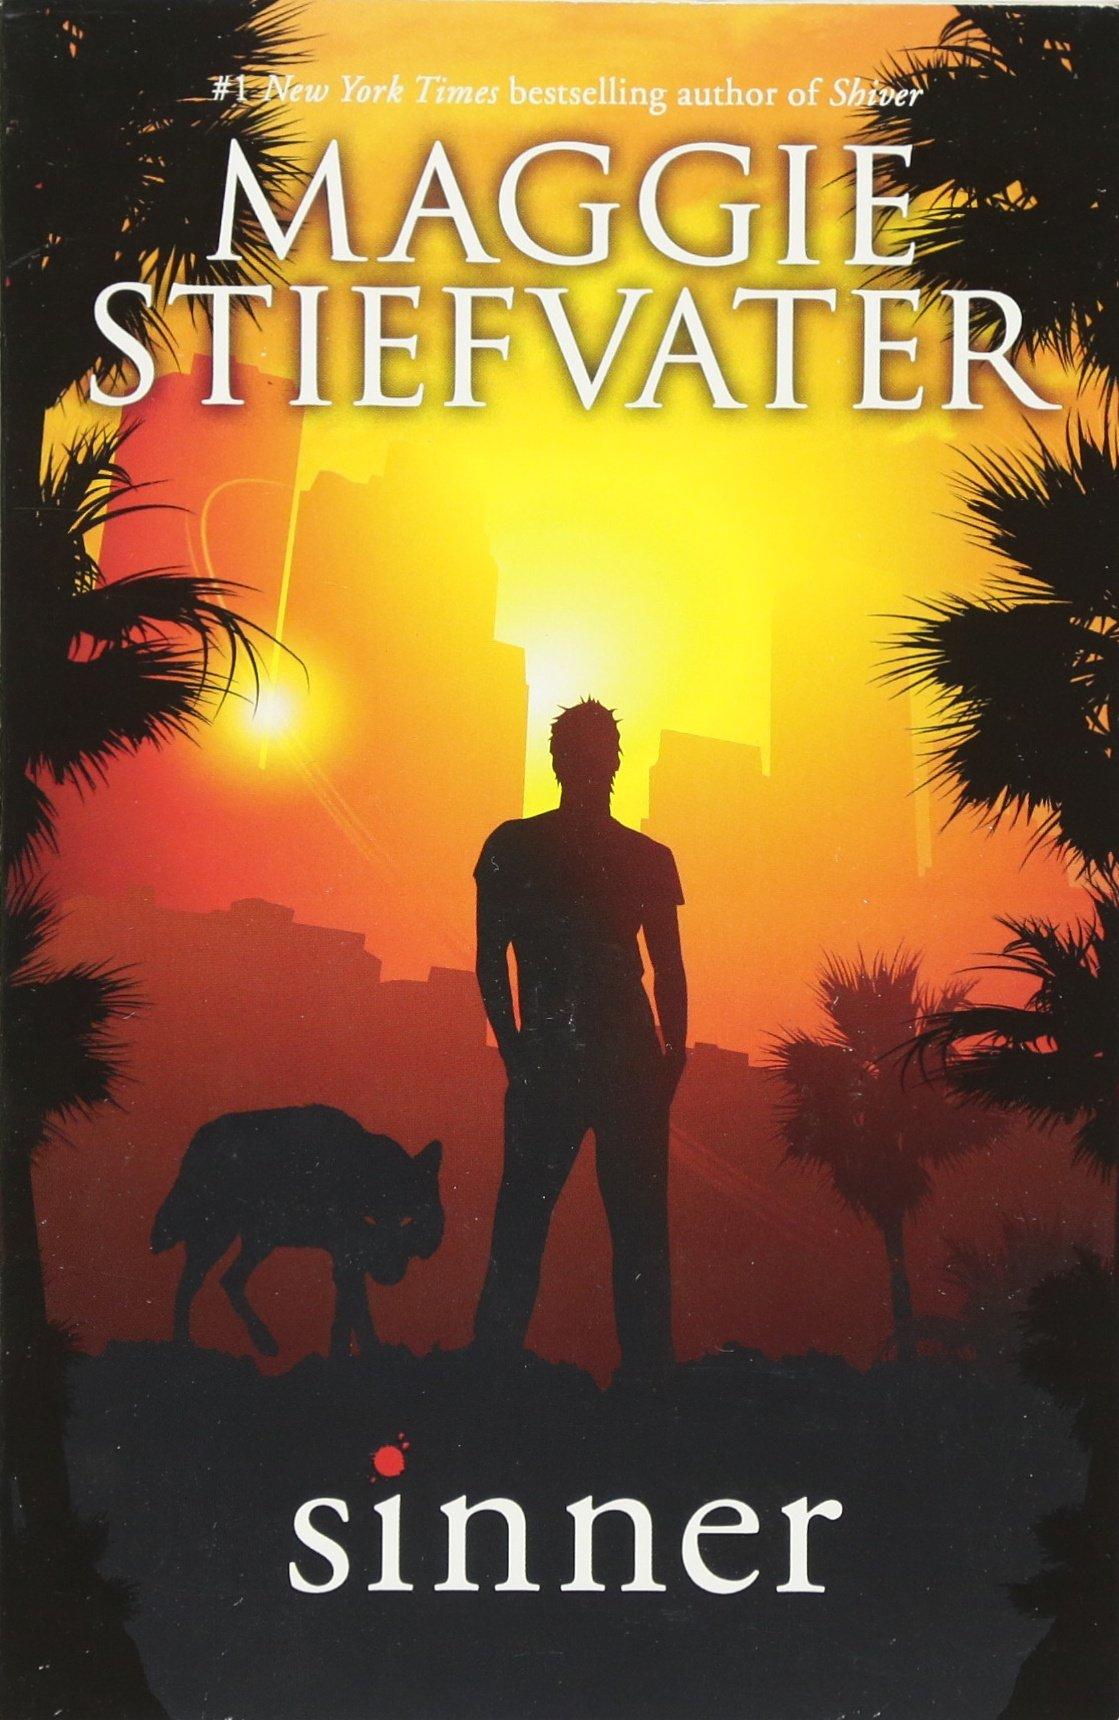 Image result for sinner book